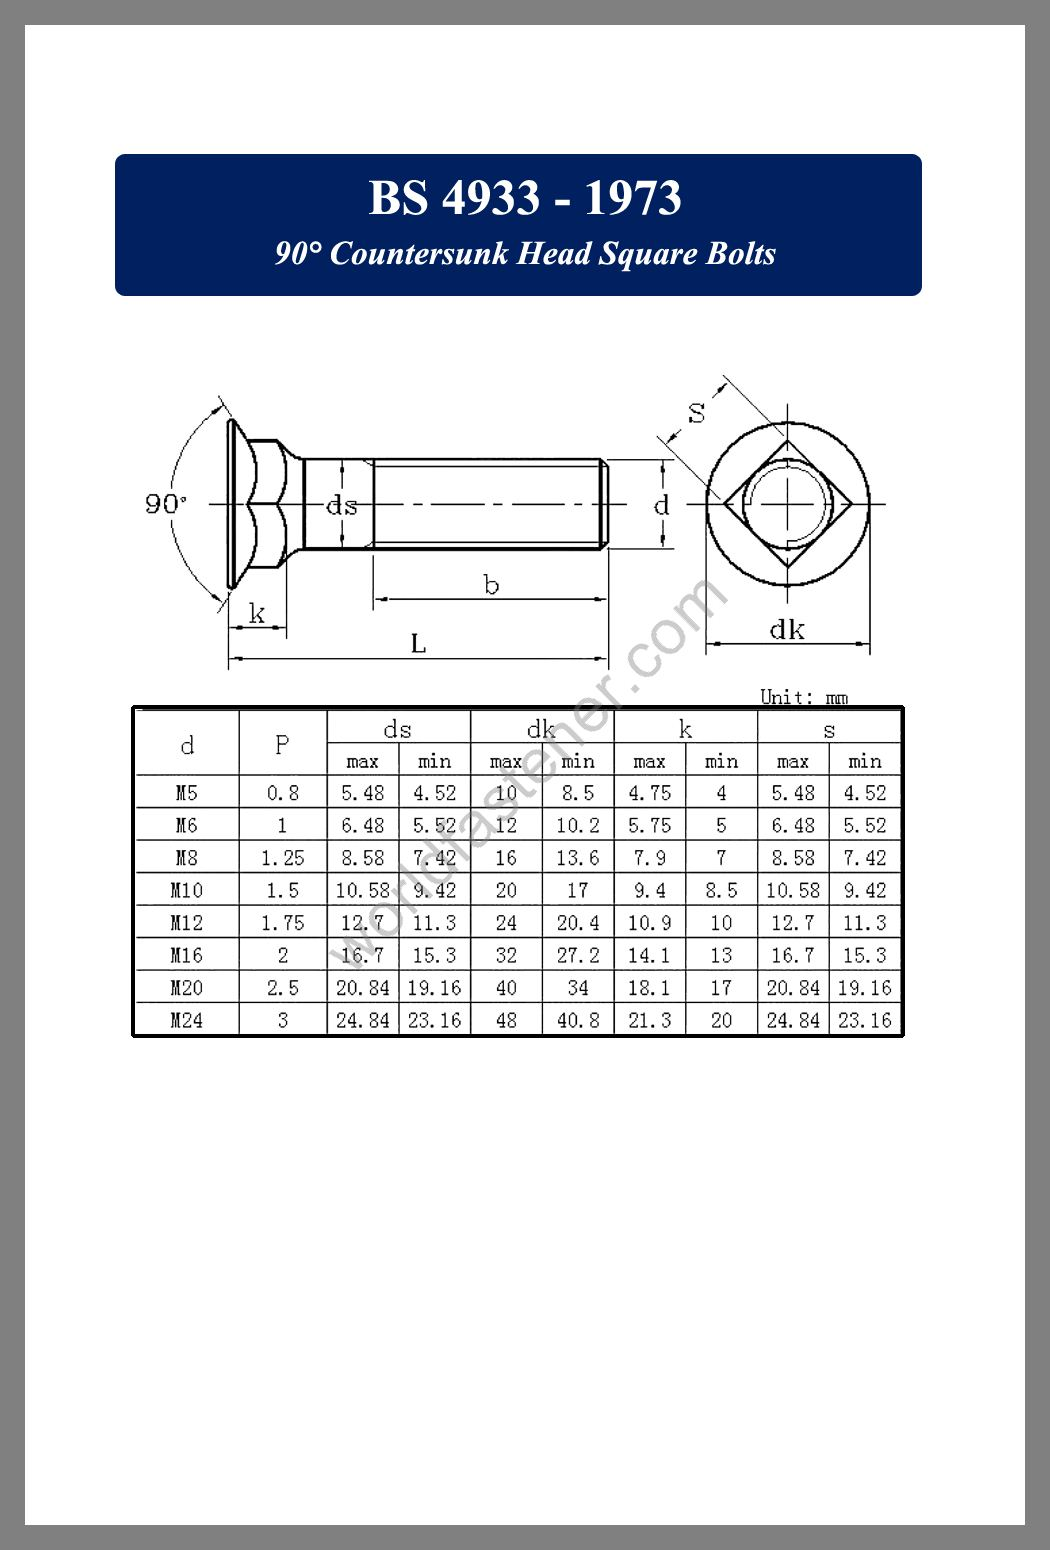 BS 4933 - 90 Degree Countersunk Head Square Bolts, Countersunk Head Bolts, Countersunk Head Screws, fastener, screw, bolt, bs standards bolts, bsi standard bolts, bsi standard screws